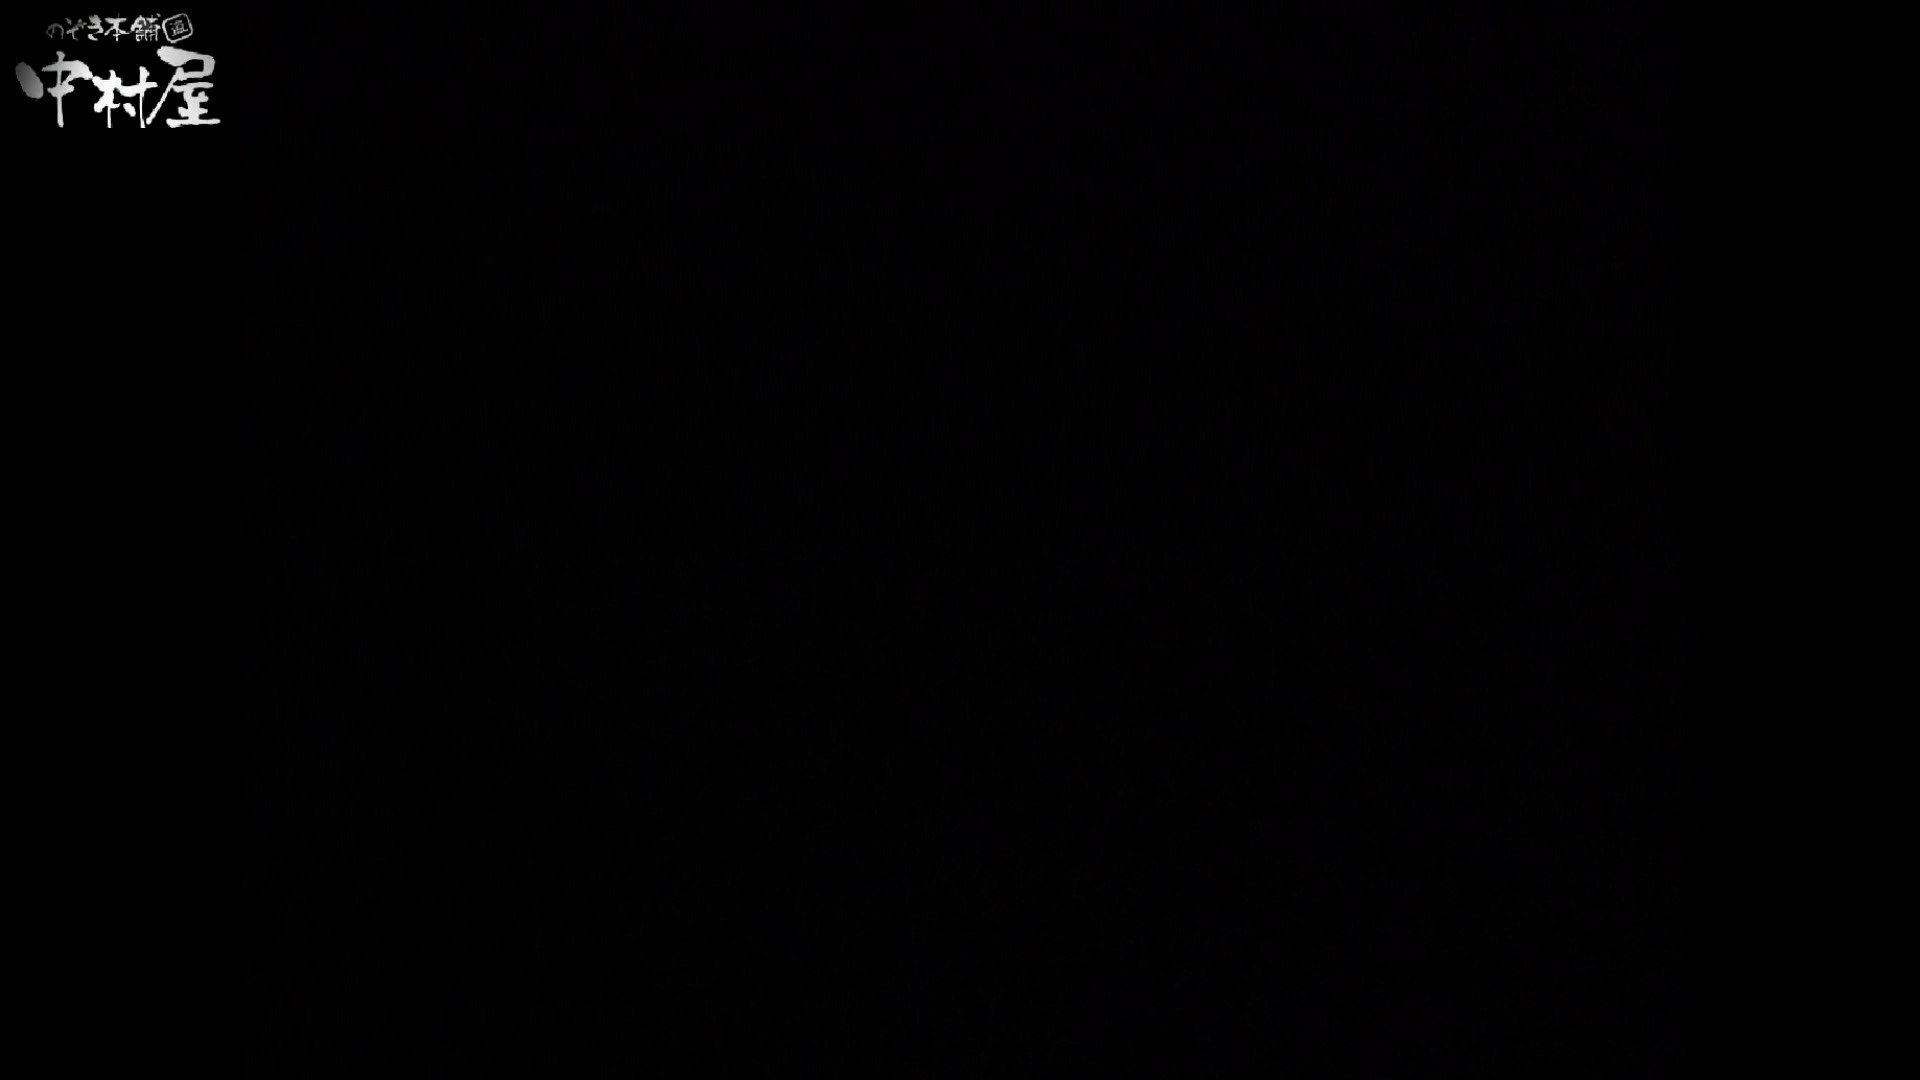 民家風呂専門盗撮師の超危険映像 vol.014後編 エロい美少女 セックス無修正動画無料 113PIX 64